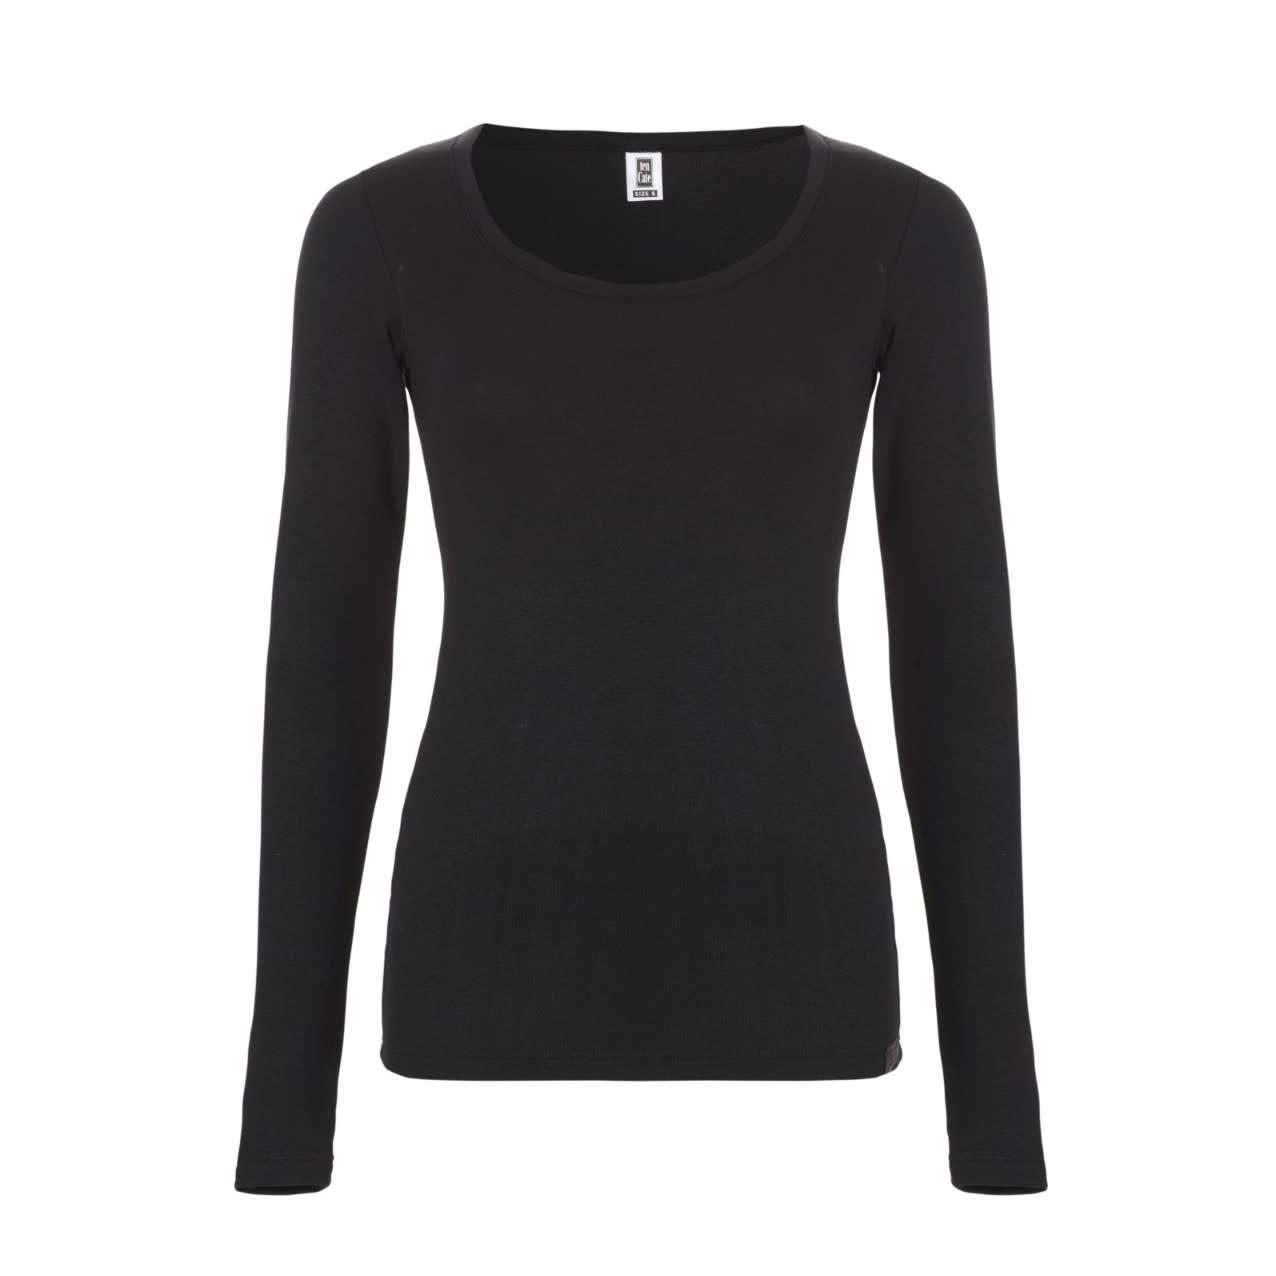 Thermo T-shirt met lange mouw 30241 - zwart-1